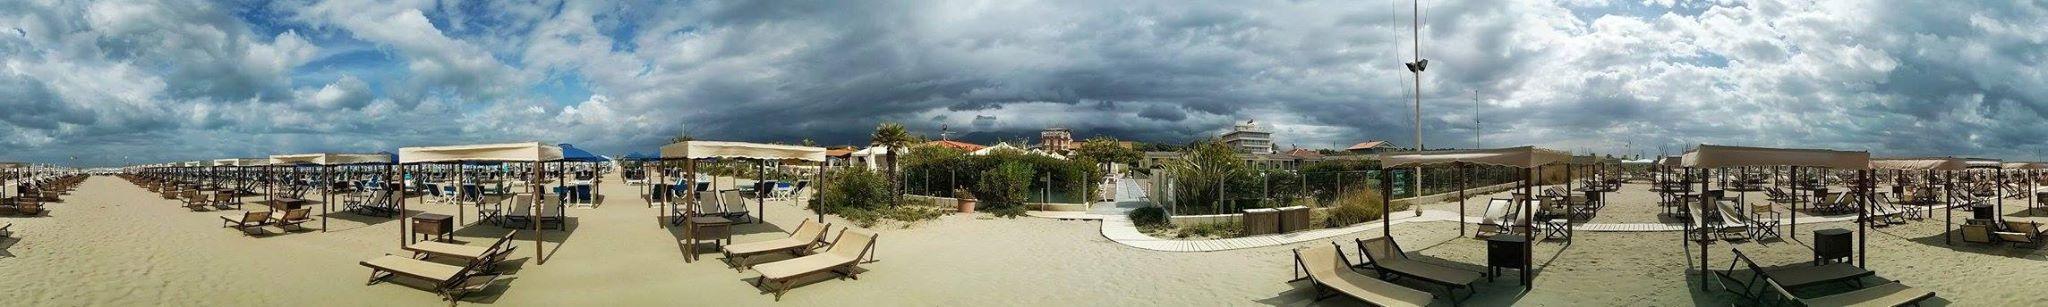 Immagine panoramica Bagno in Versailia Stella Bianca